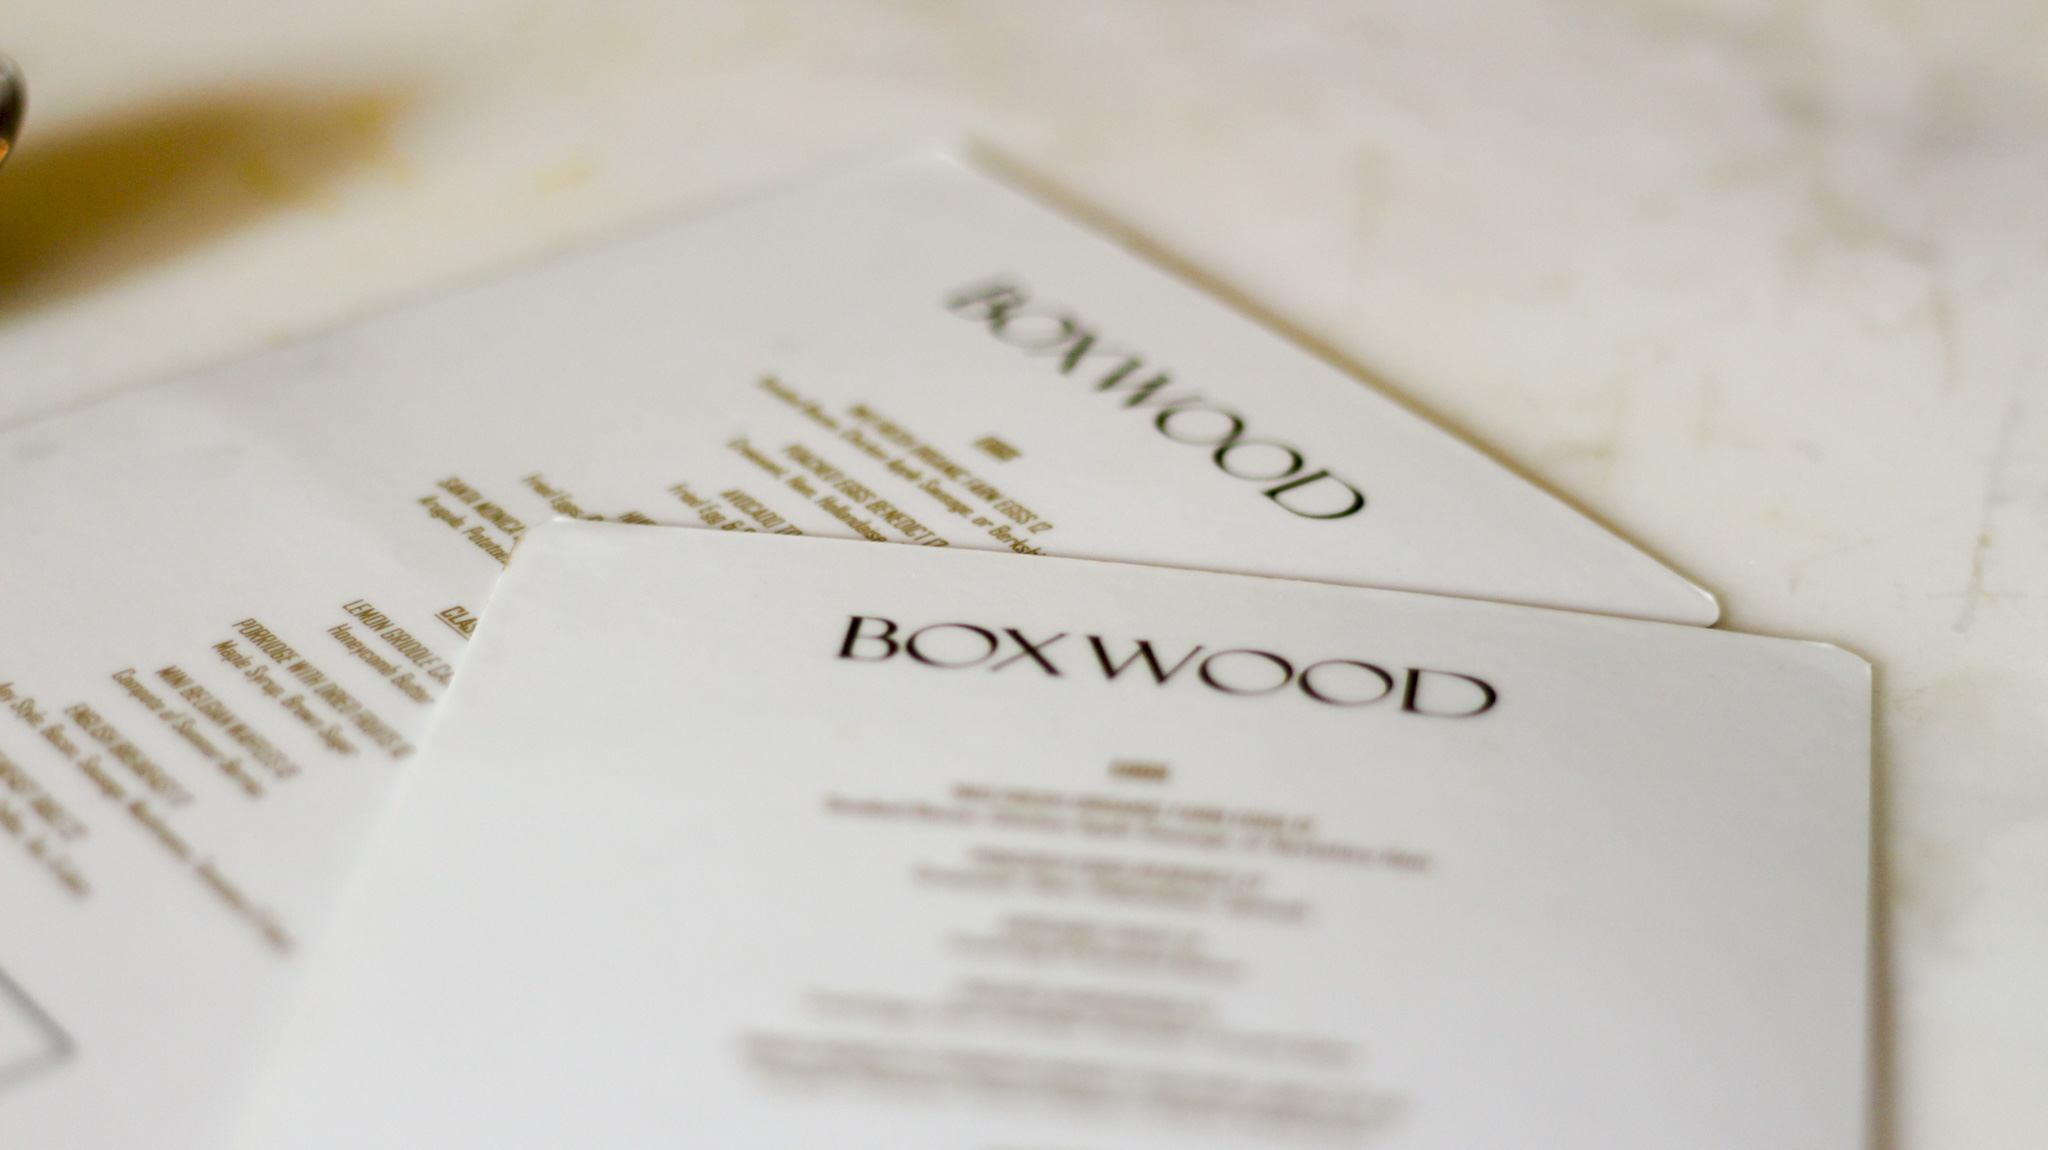 Boxwood at The London menus